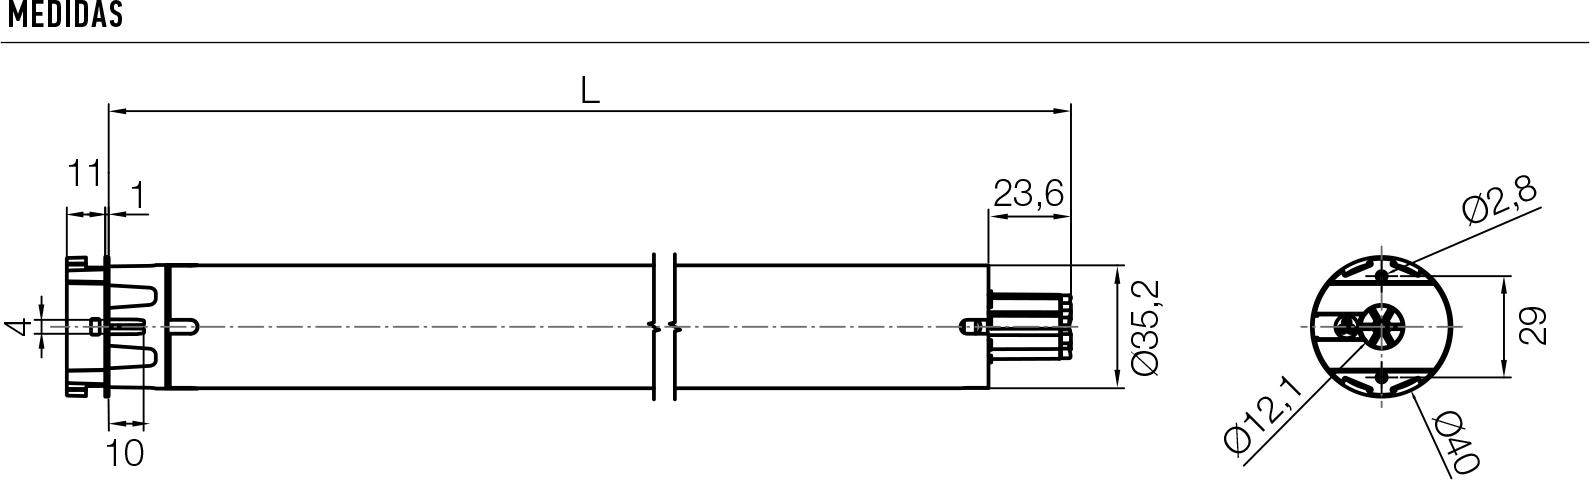 caracteristicas-era-mat-sa-2